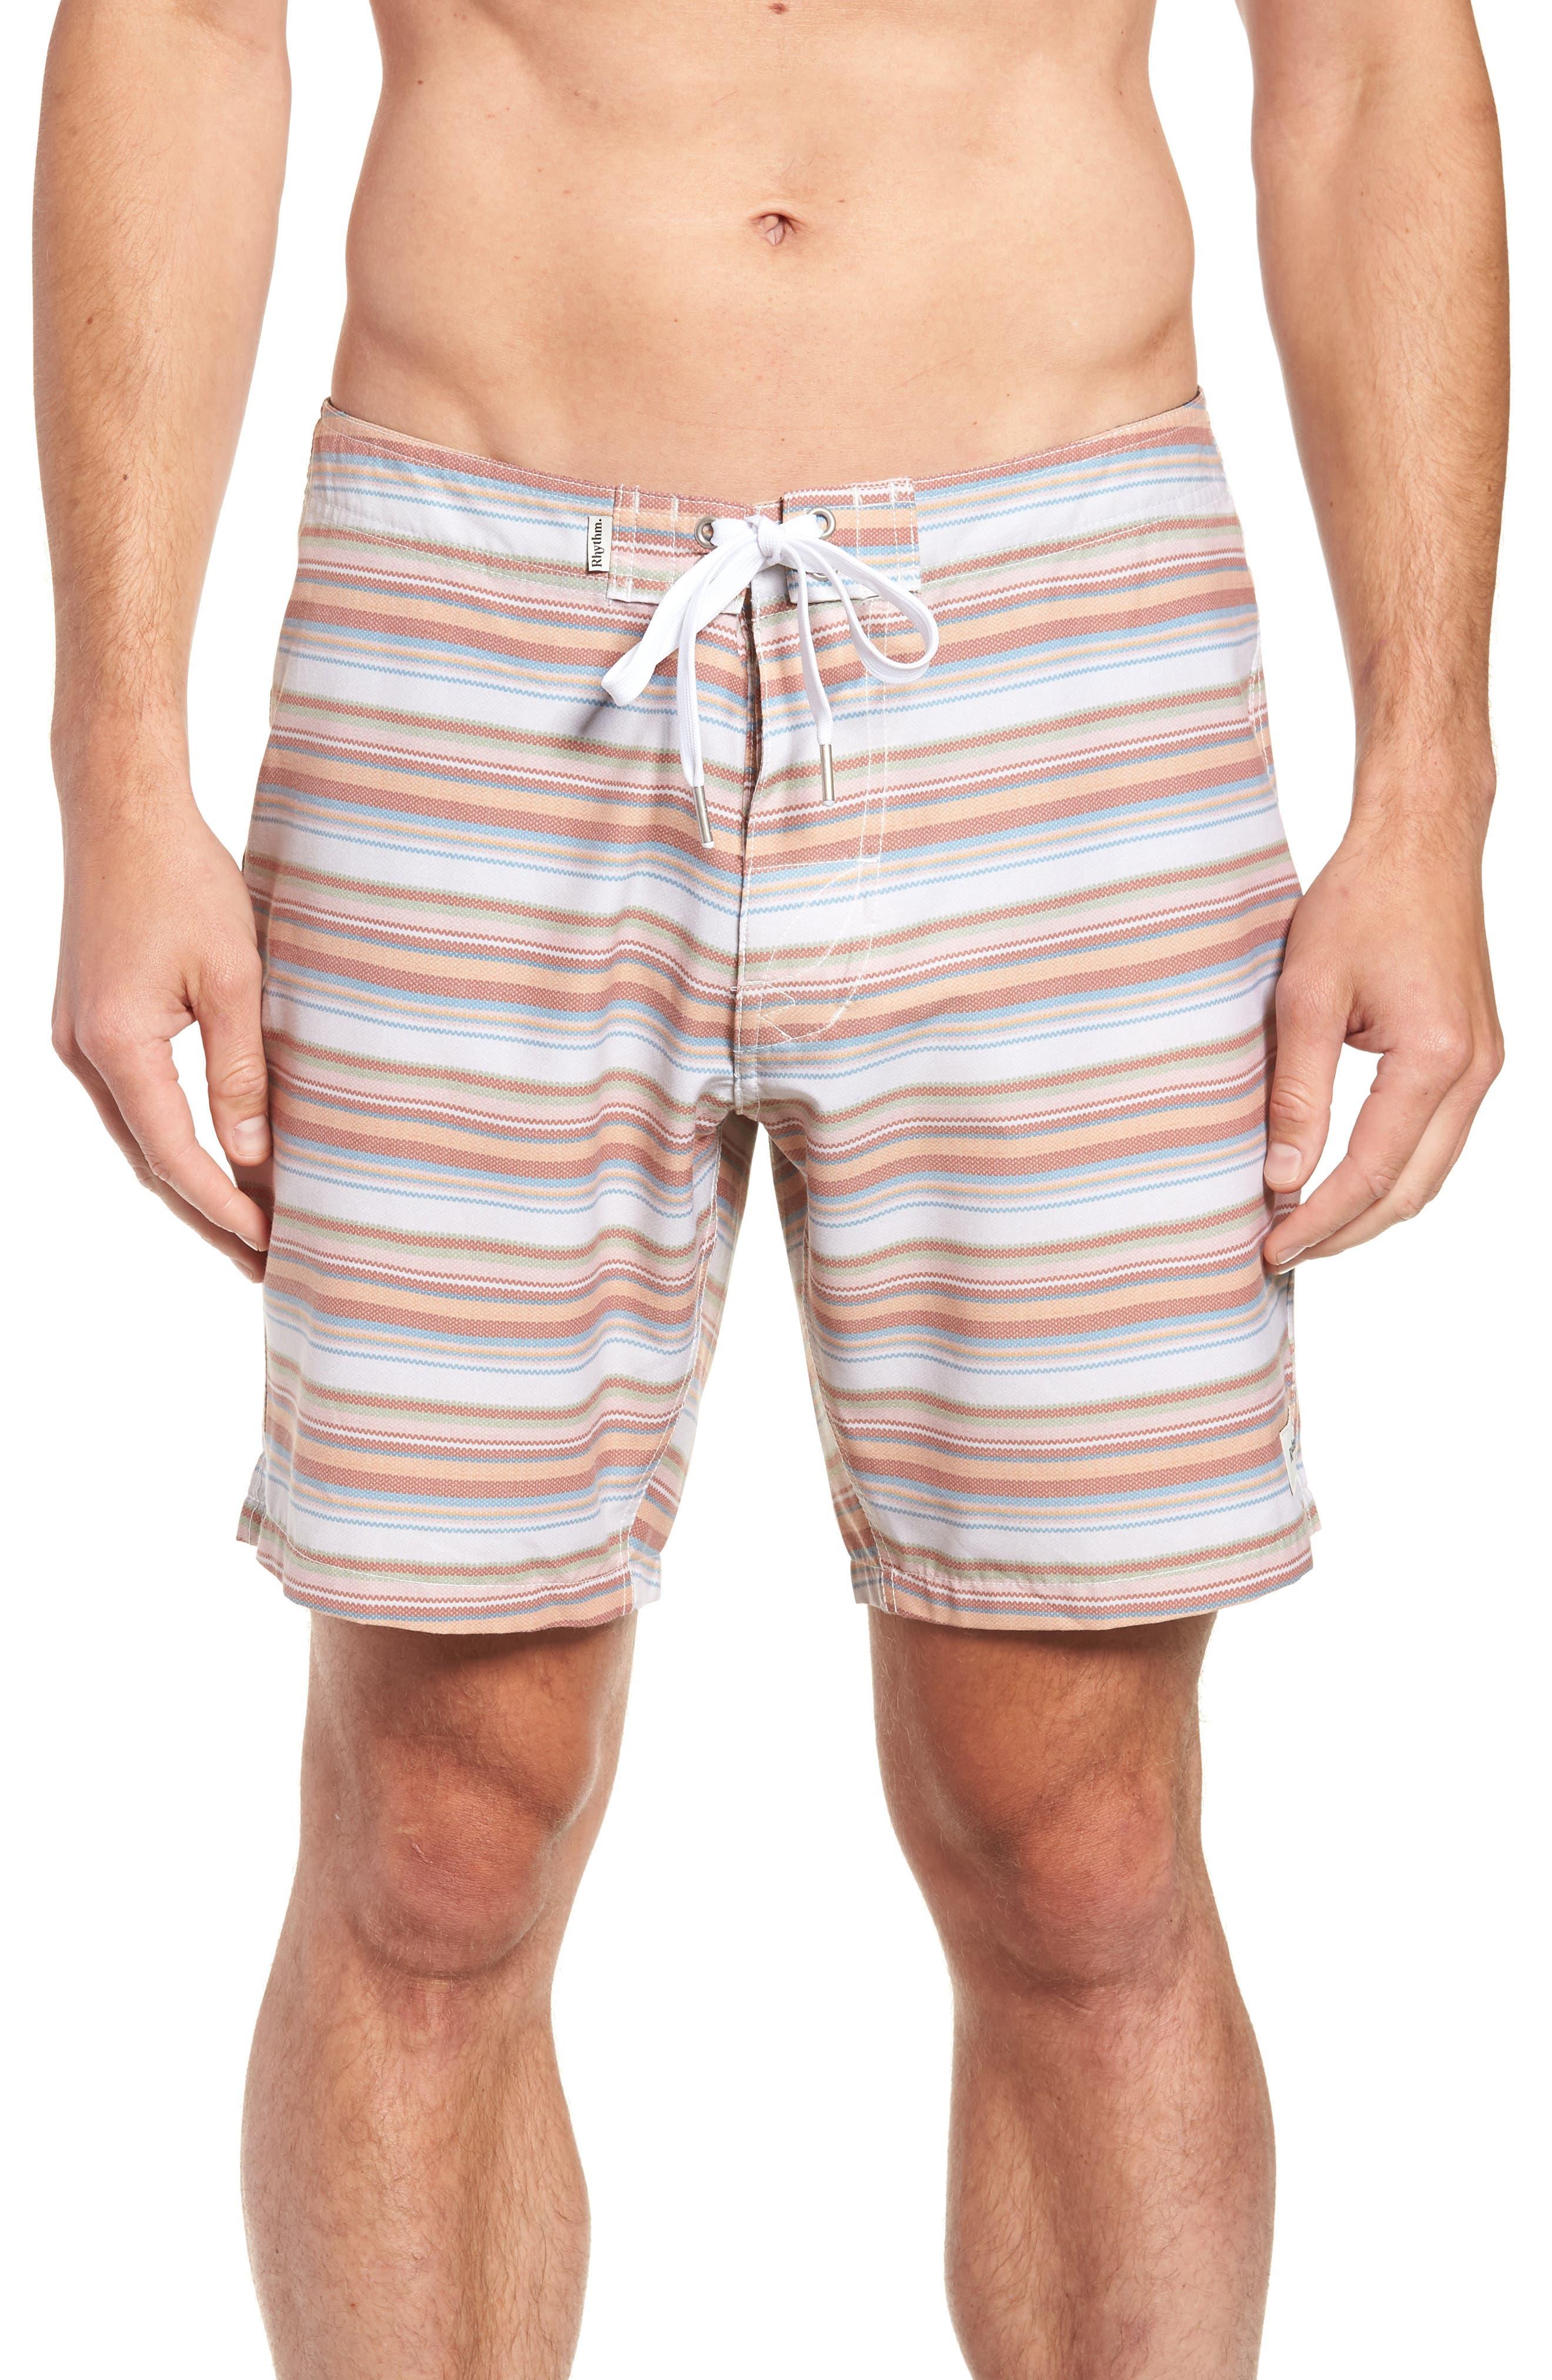 Rhythm Tuscan Stripe Swim Trunks, Orange